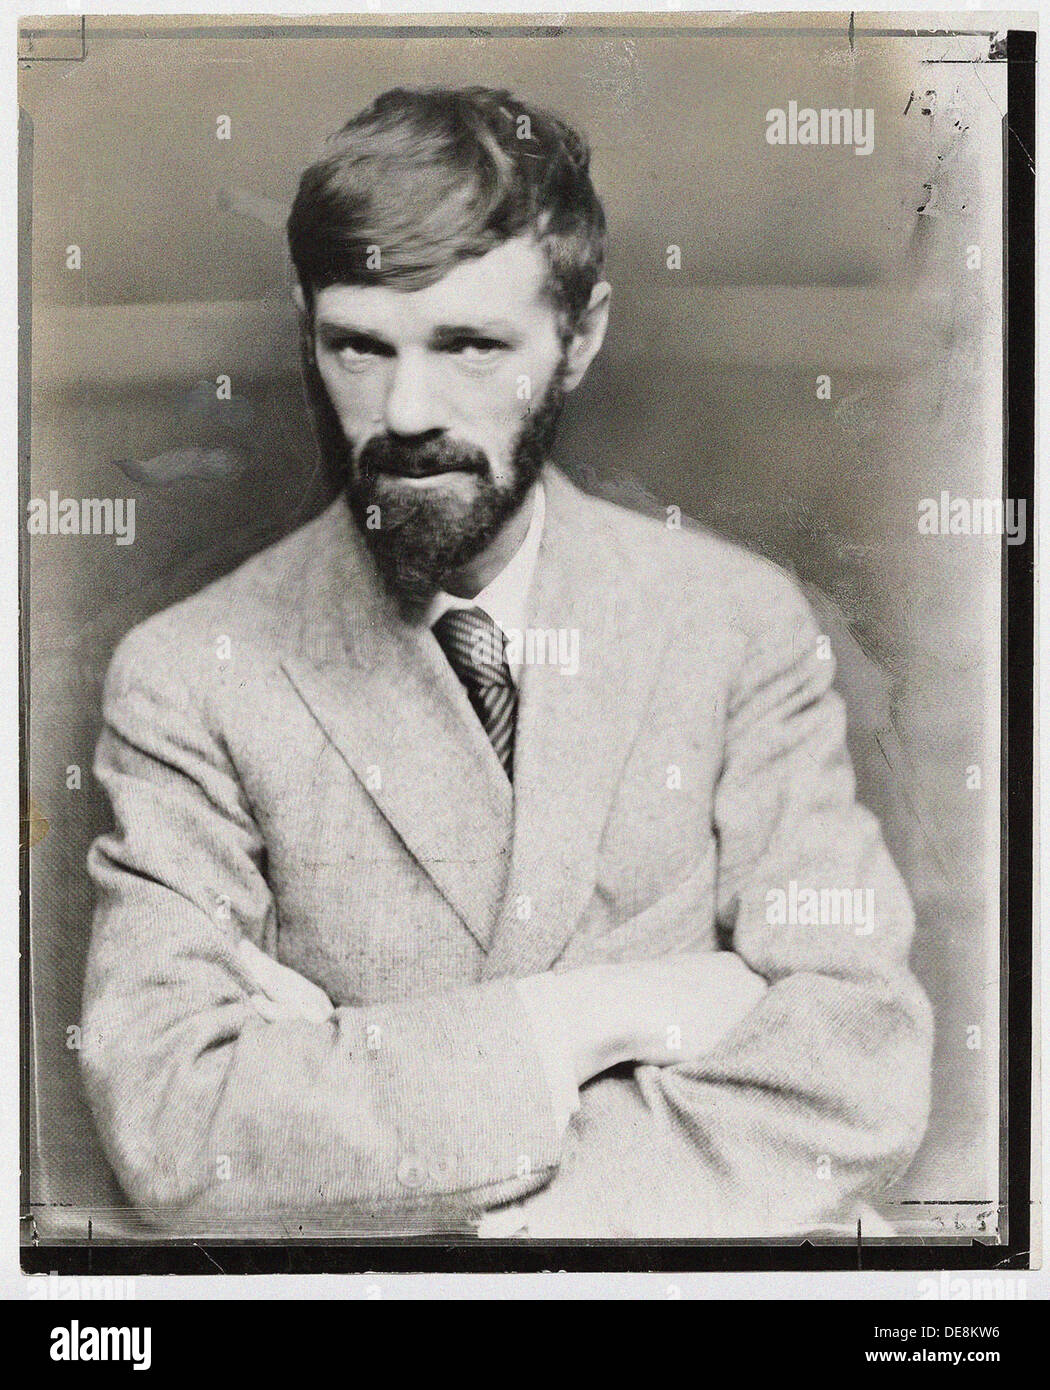 David Herbert Lawrence (1885-1930), End 1920s. Stock Photo